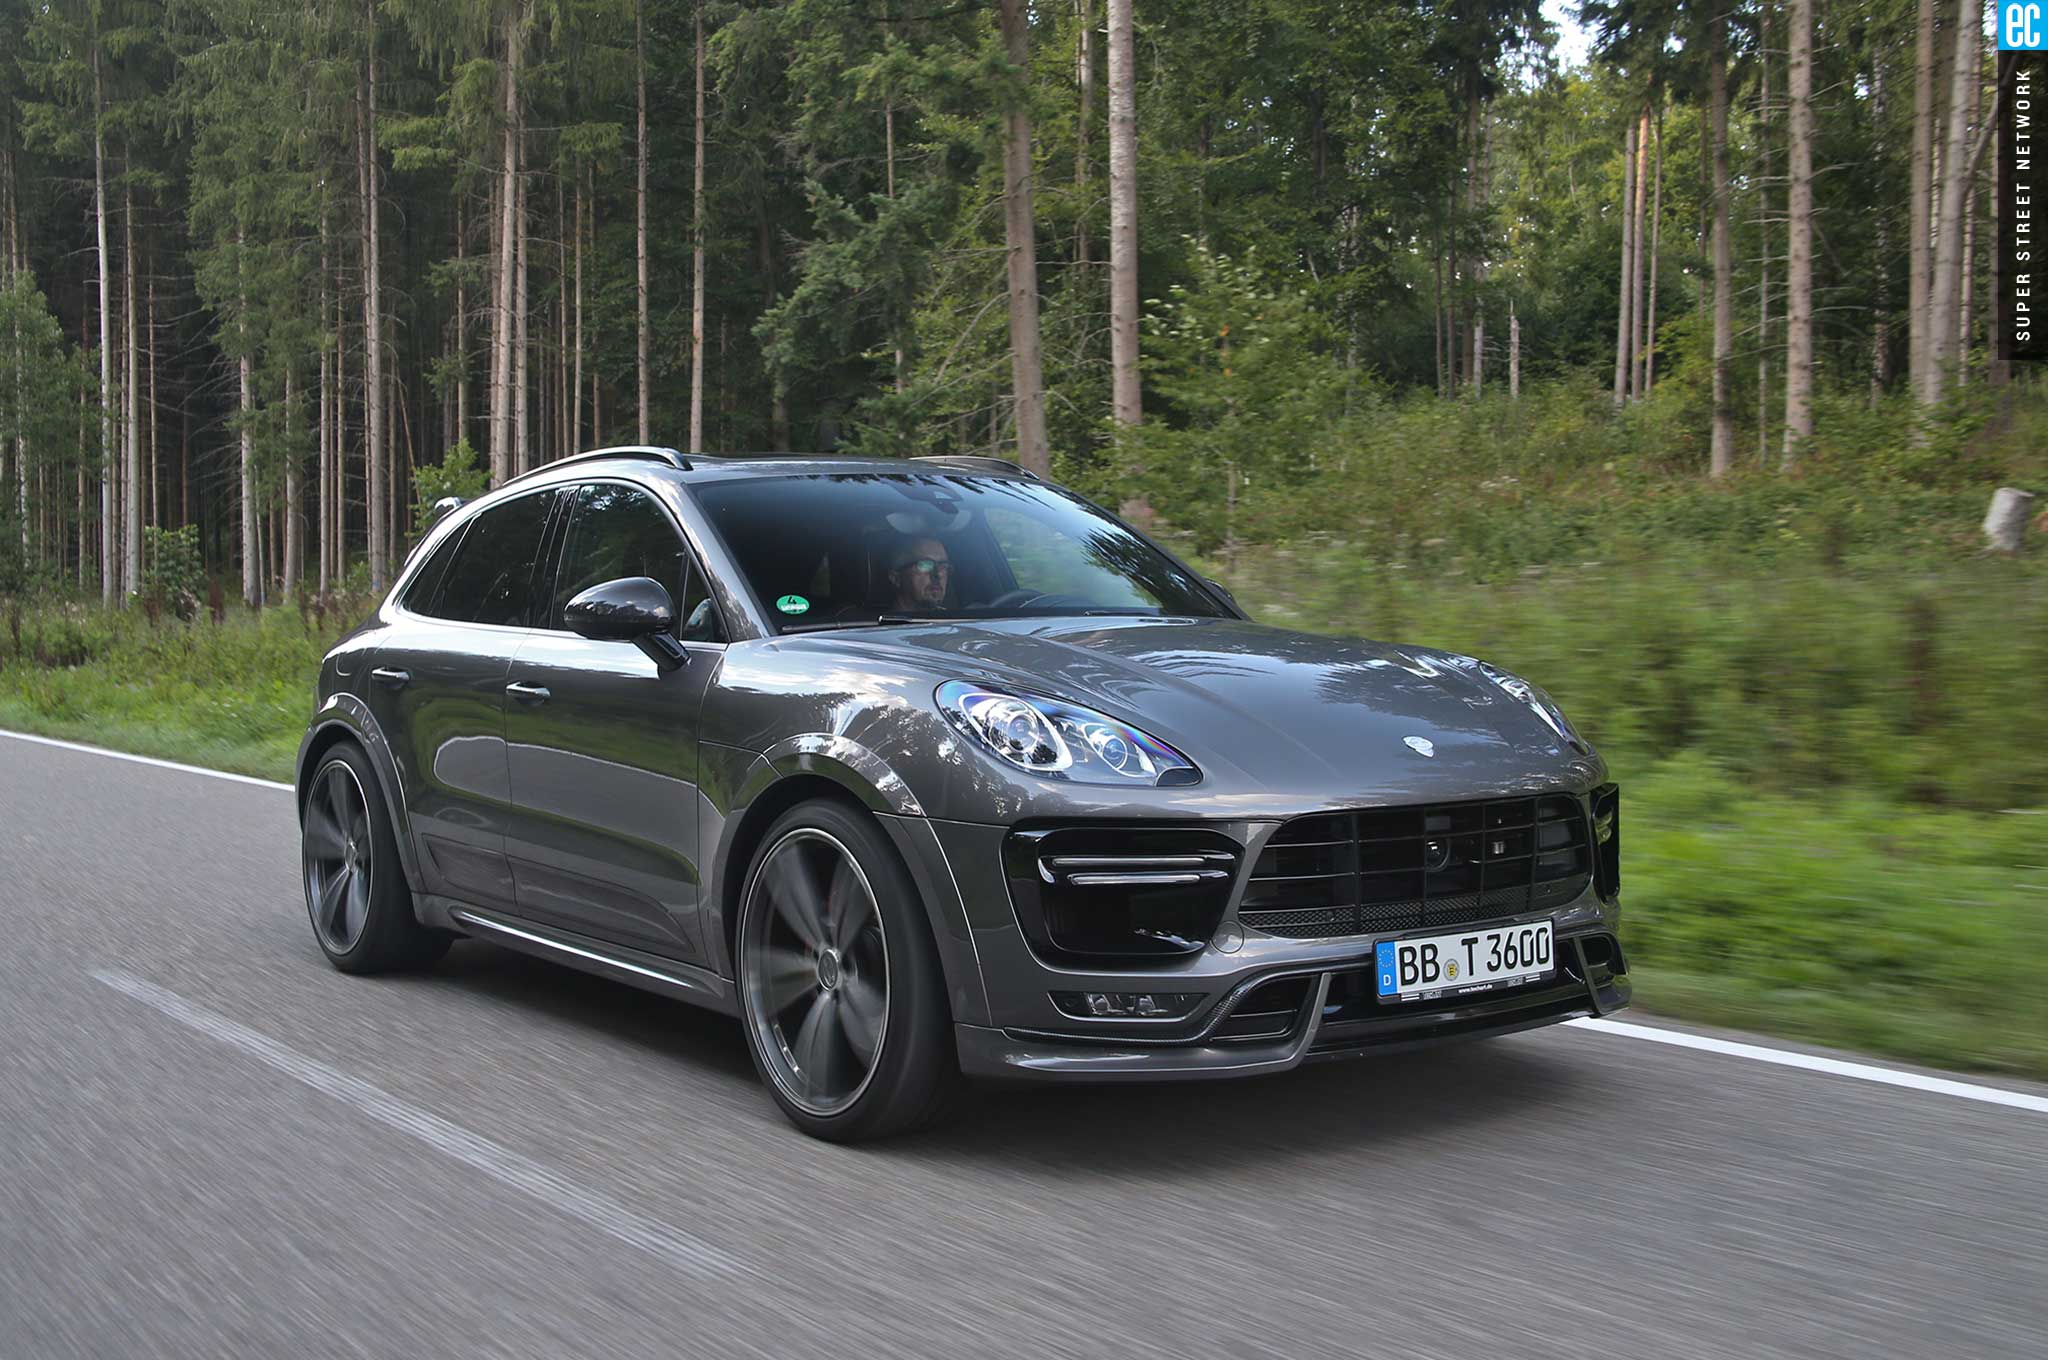 Techart Heats Up The 2015 Porsche Macan Turbo Automobile